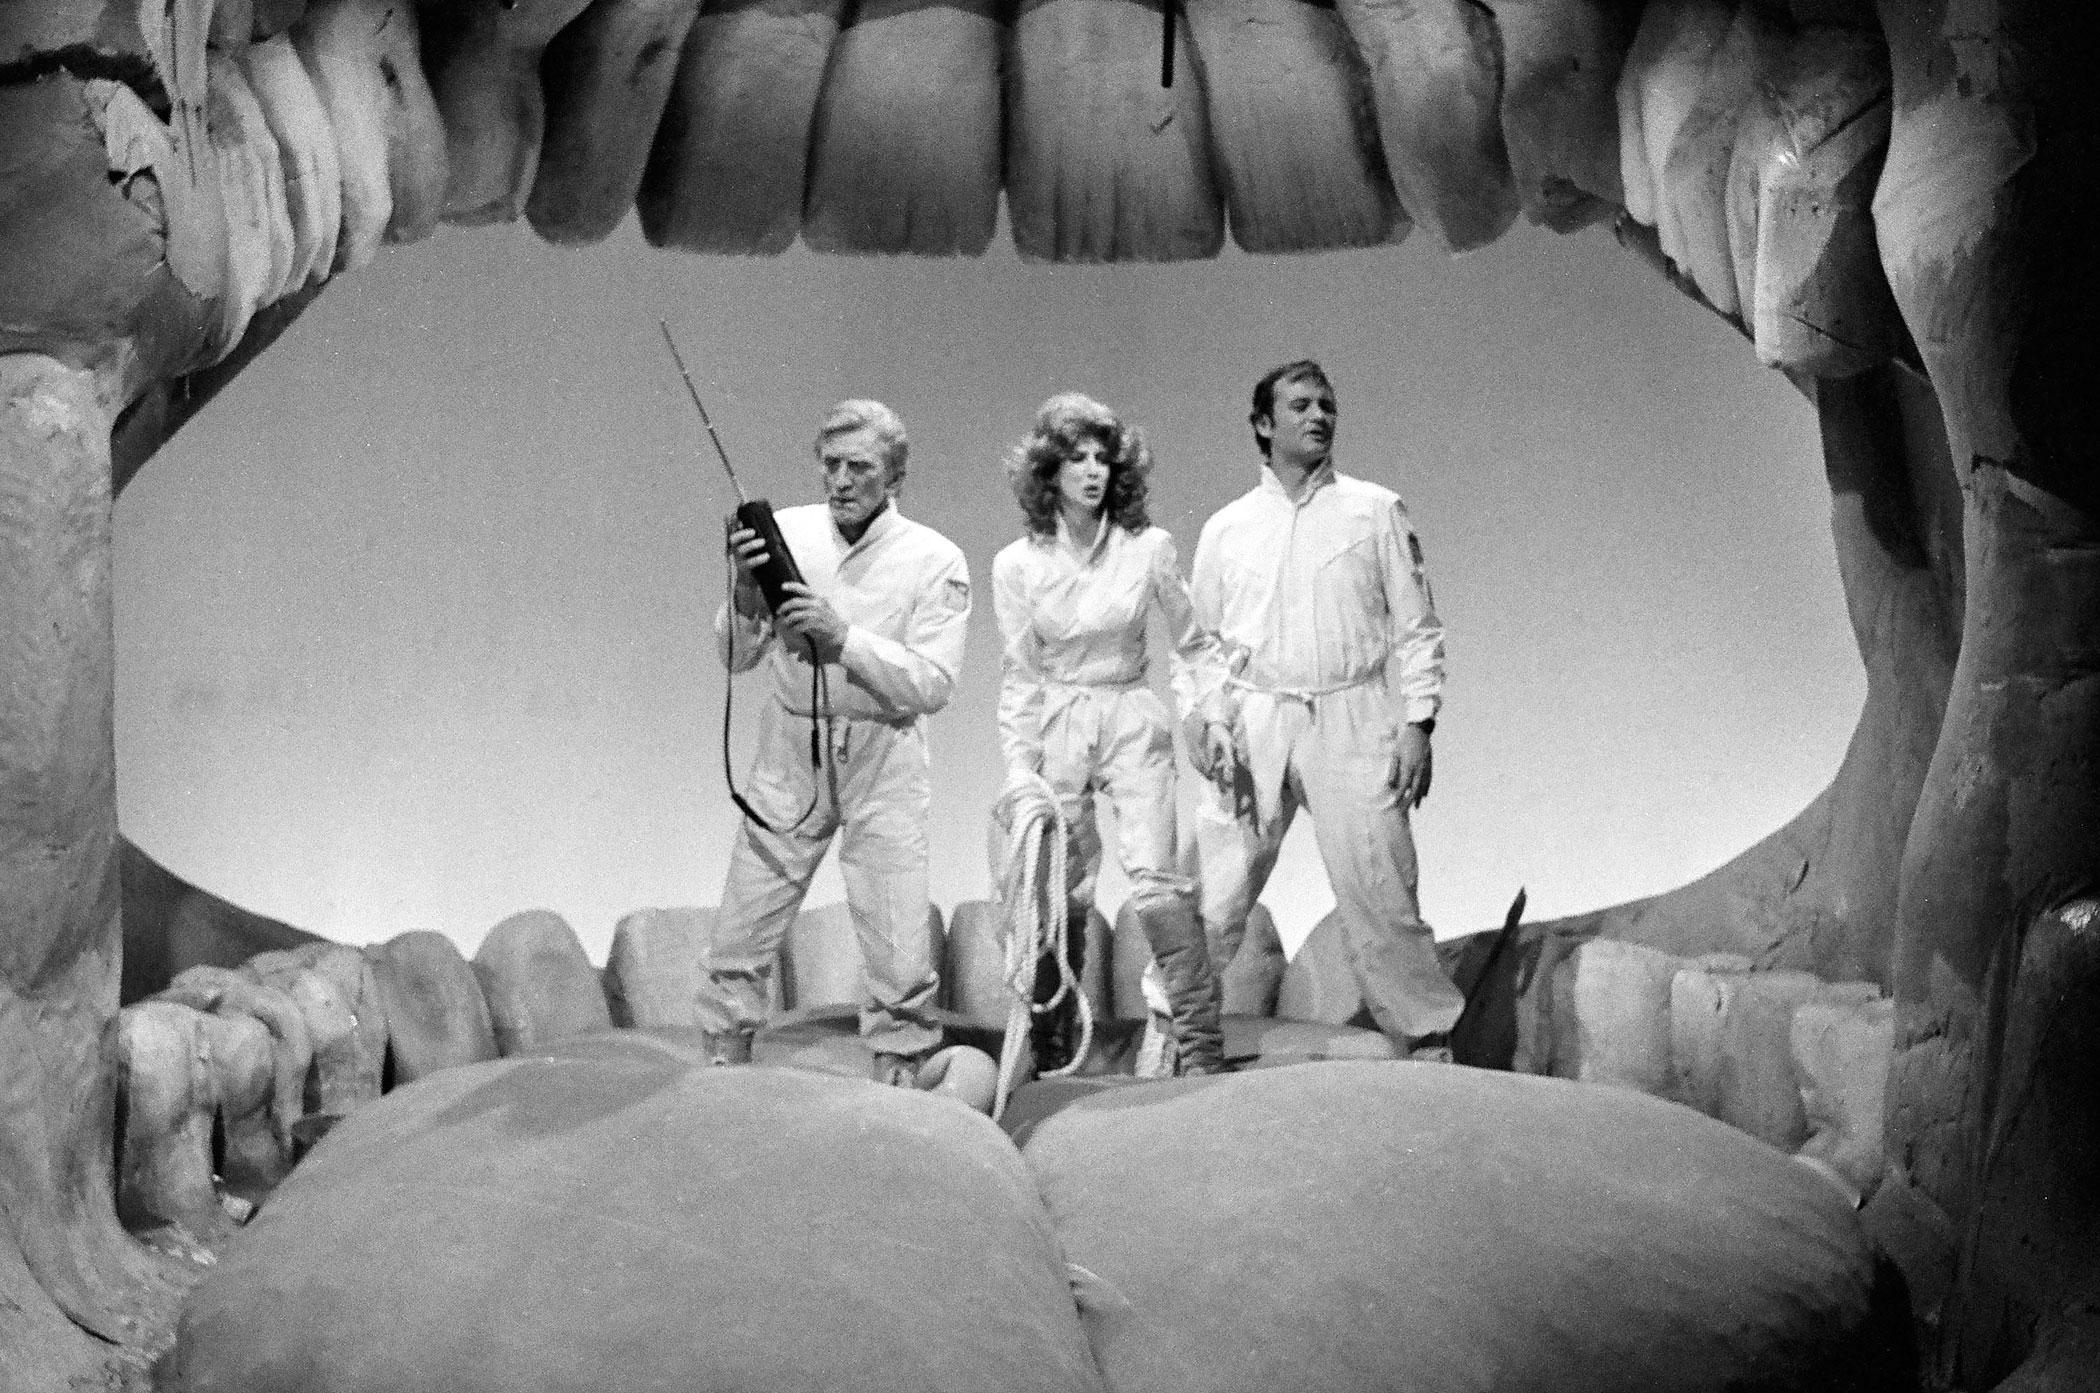 Kirk Douglas as Colonel Lloyd D. Westman, Laraine Newman as Nicole Westman and Bill Murray as Captain Steve McCleod during the 'The Micro-Dentists' skit on February 23, 1980.